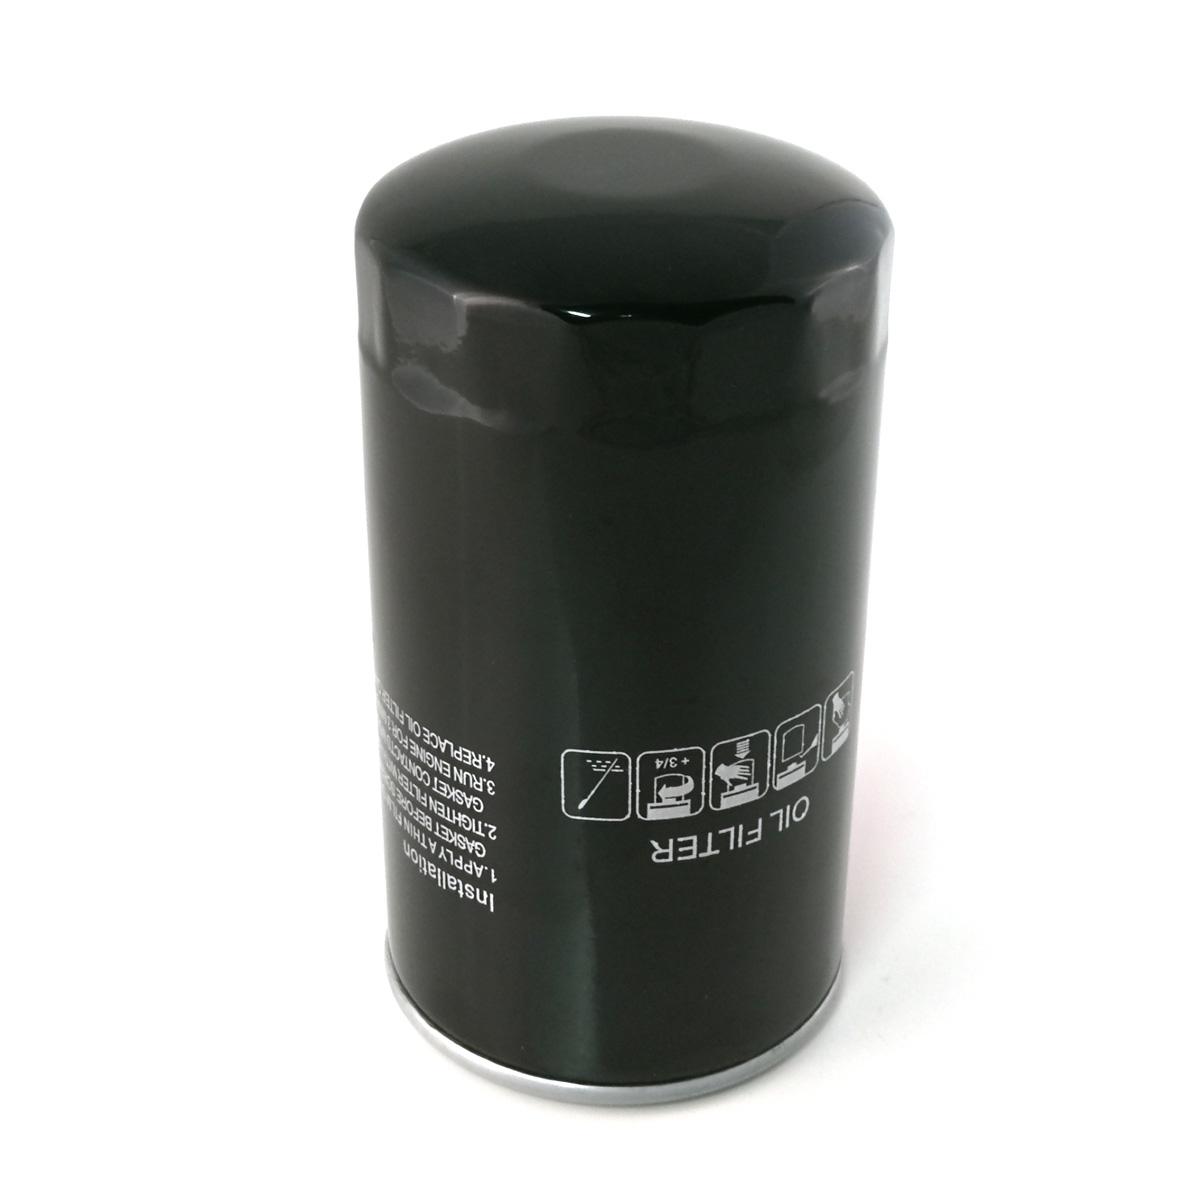 Ölfilter für Volvo 740 + Kombi, 760 + Kombi, 780, 940, VW entsp. W950/4, FO1445